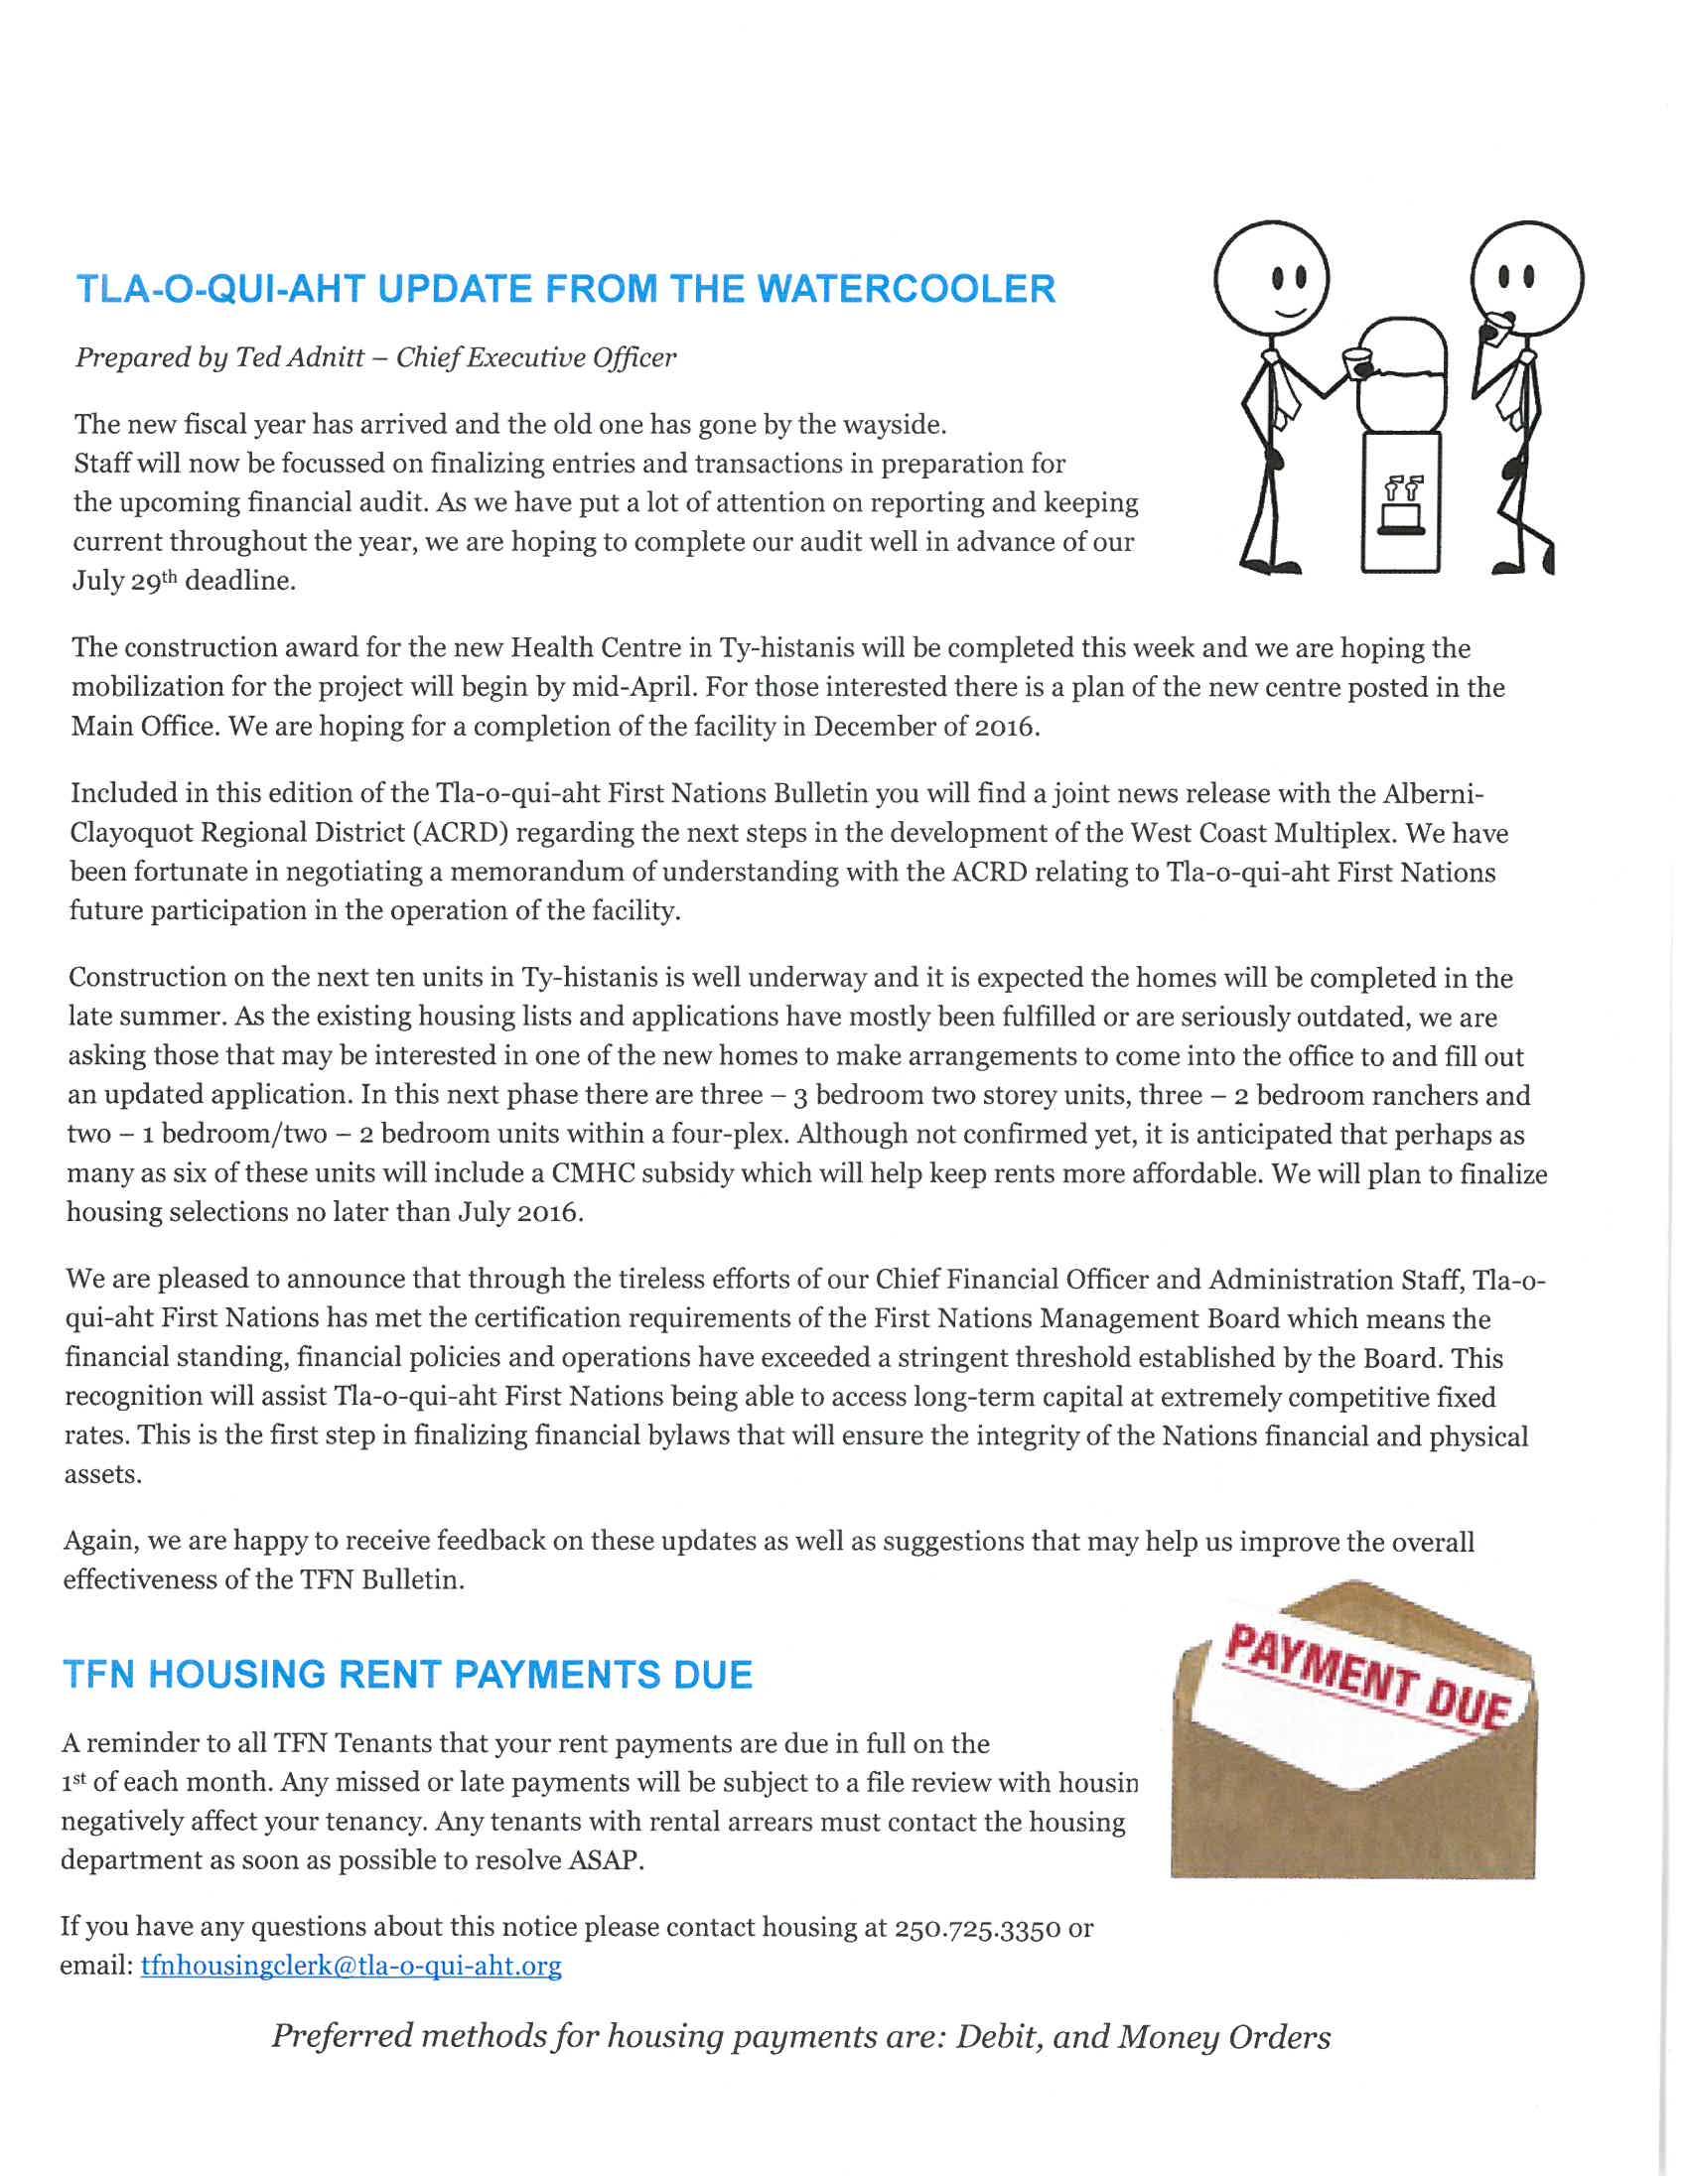 TFN Bulletin Apr 6-2016_Page_04.jpg